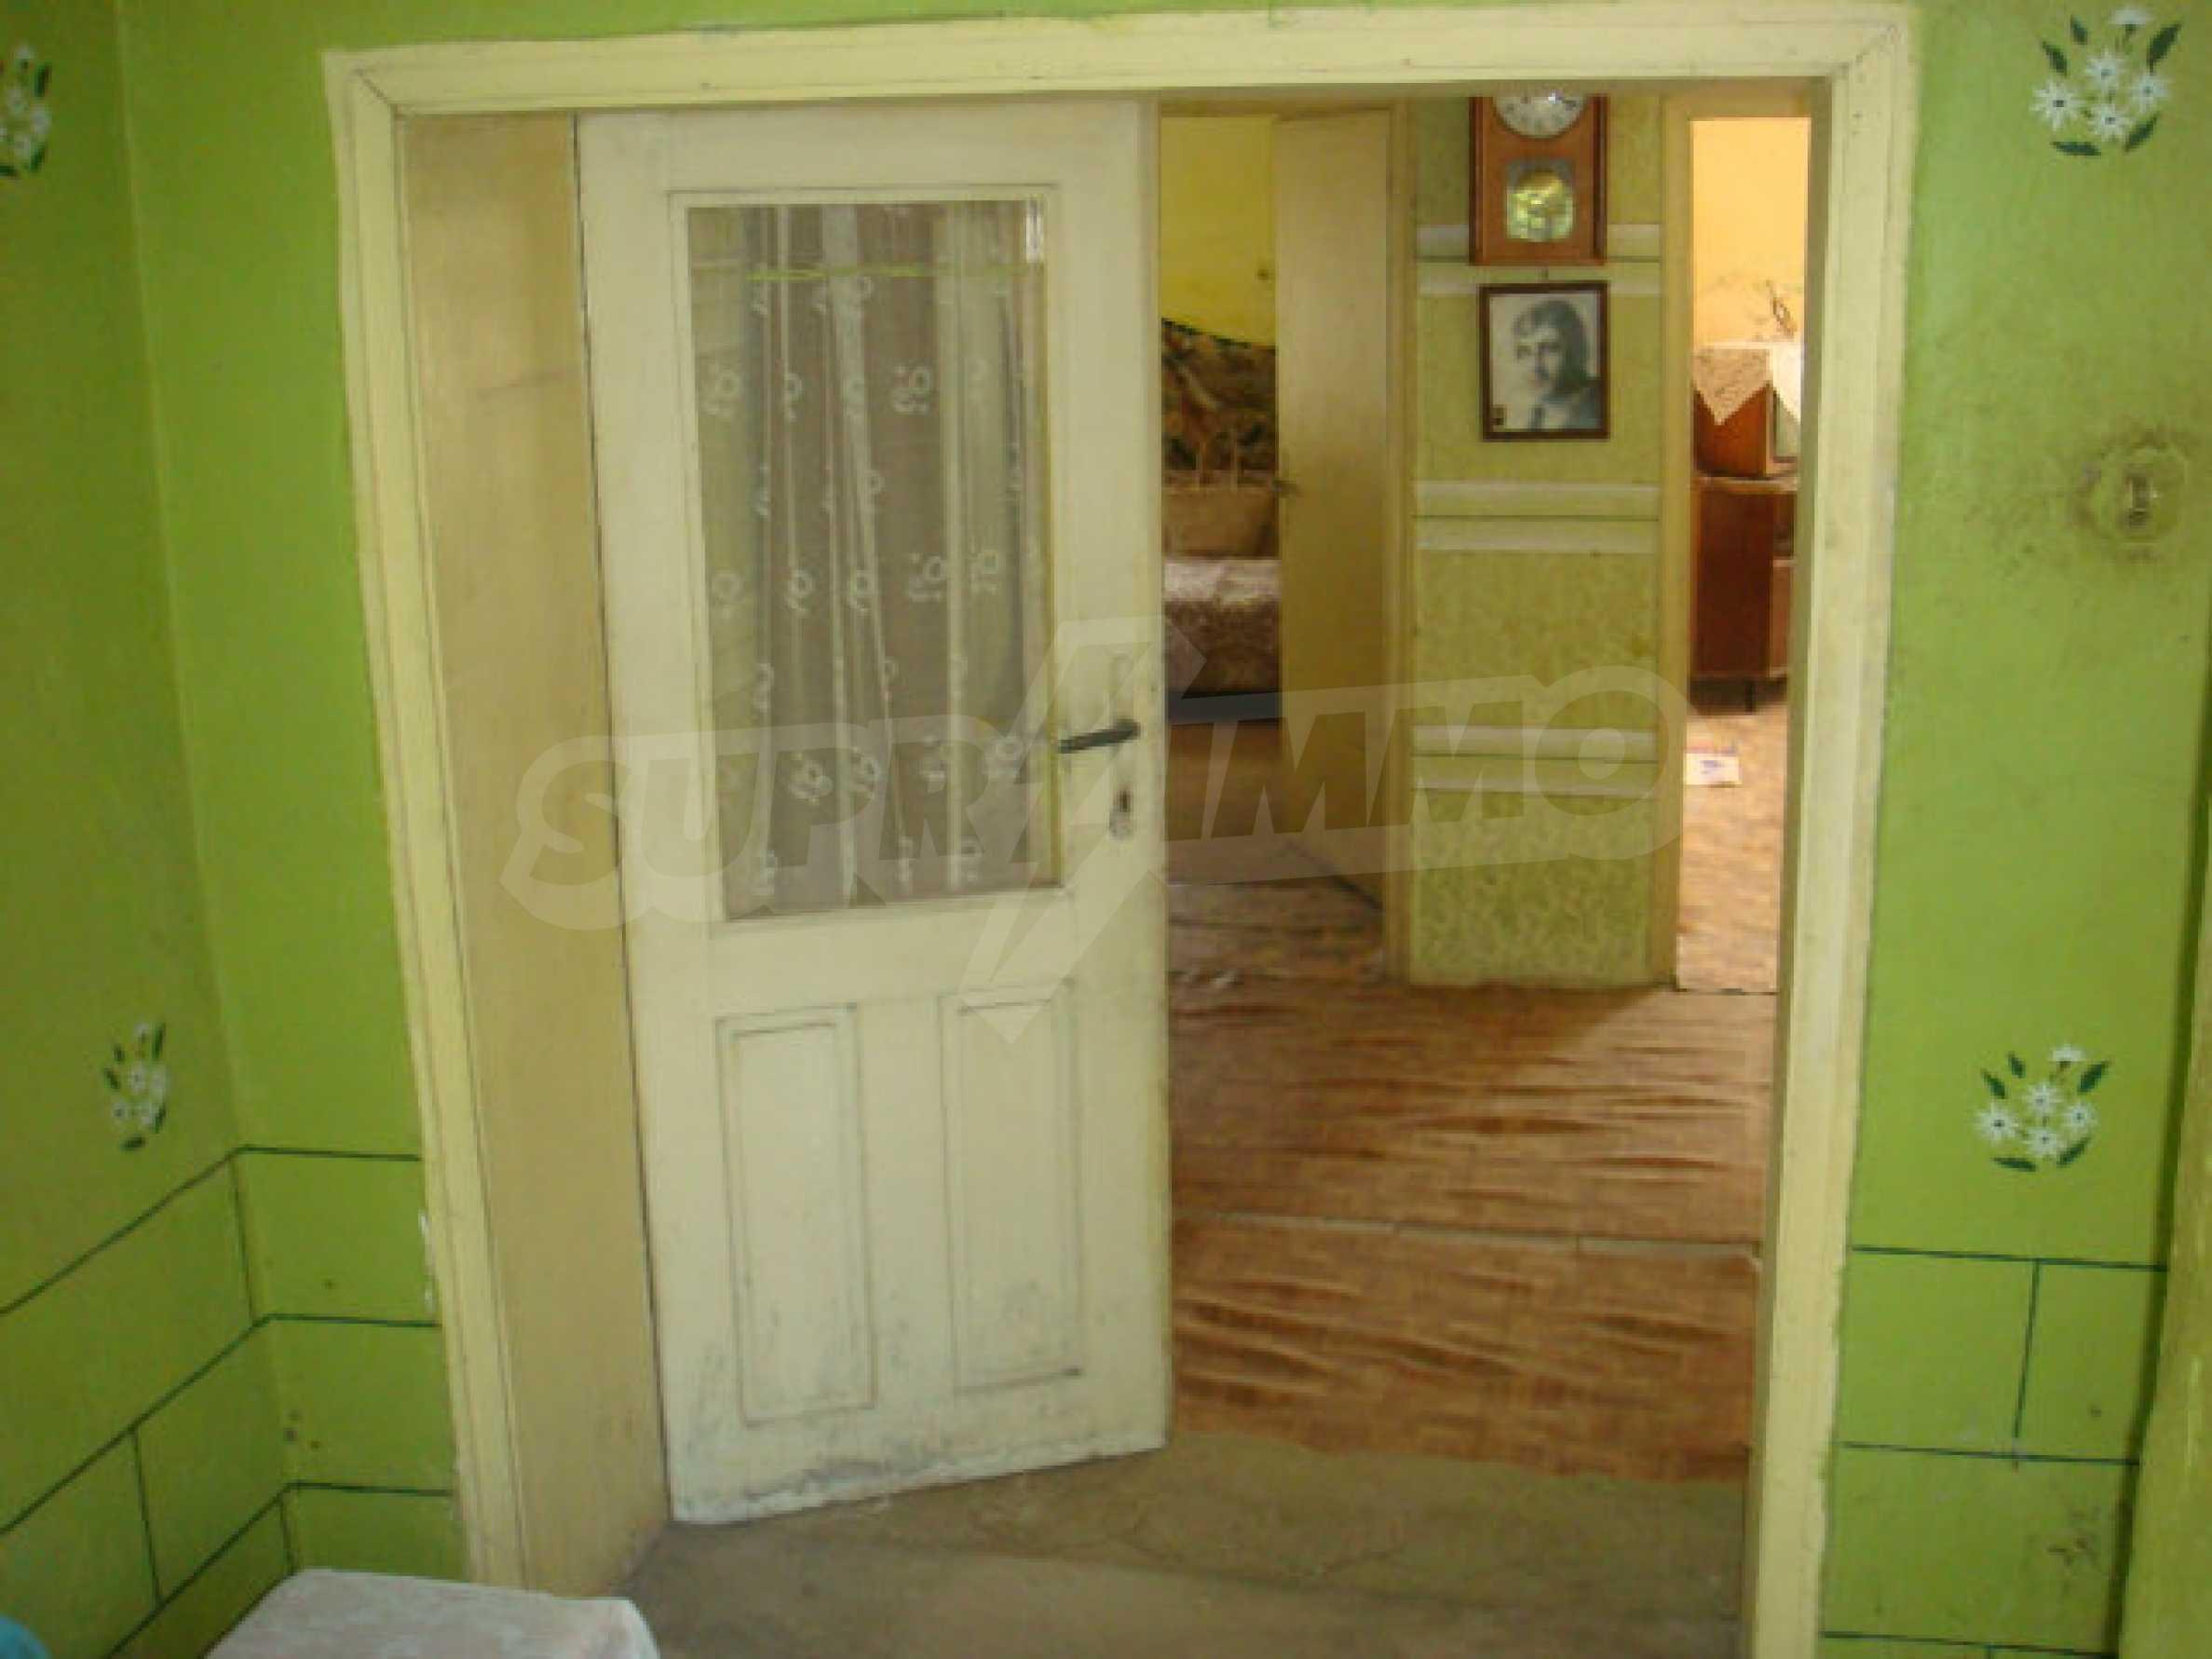 House for sale in village near Vidin 8